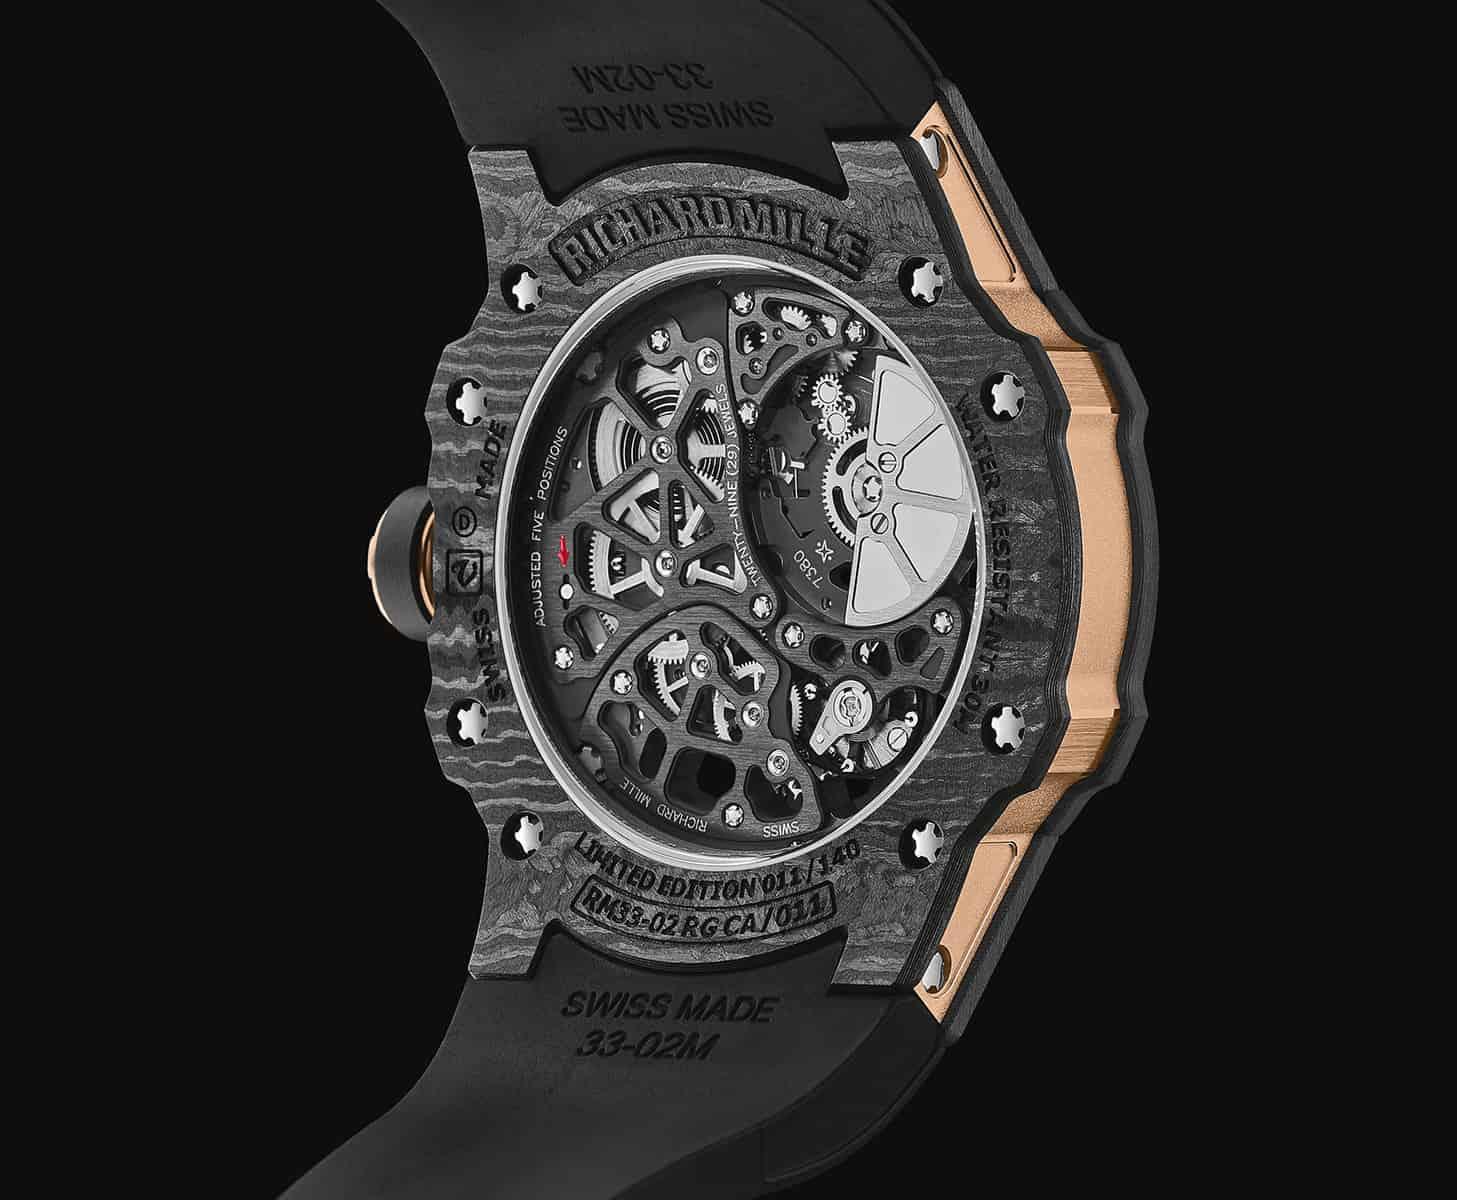 Richard Mille RM 33-02 2